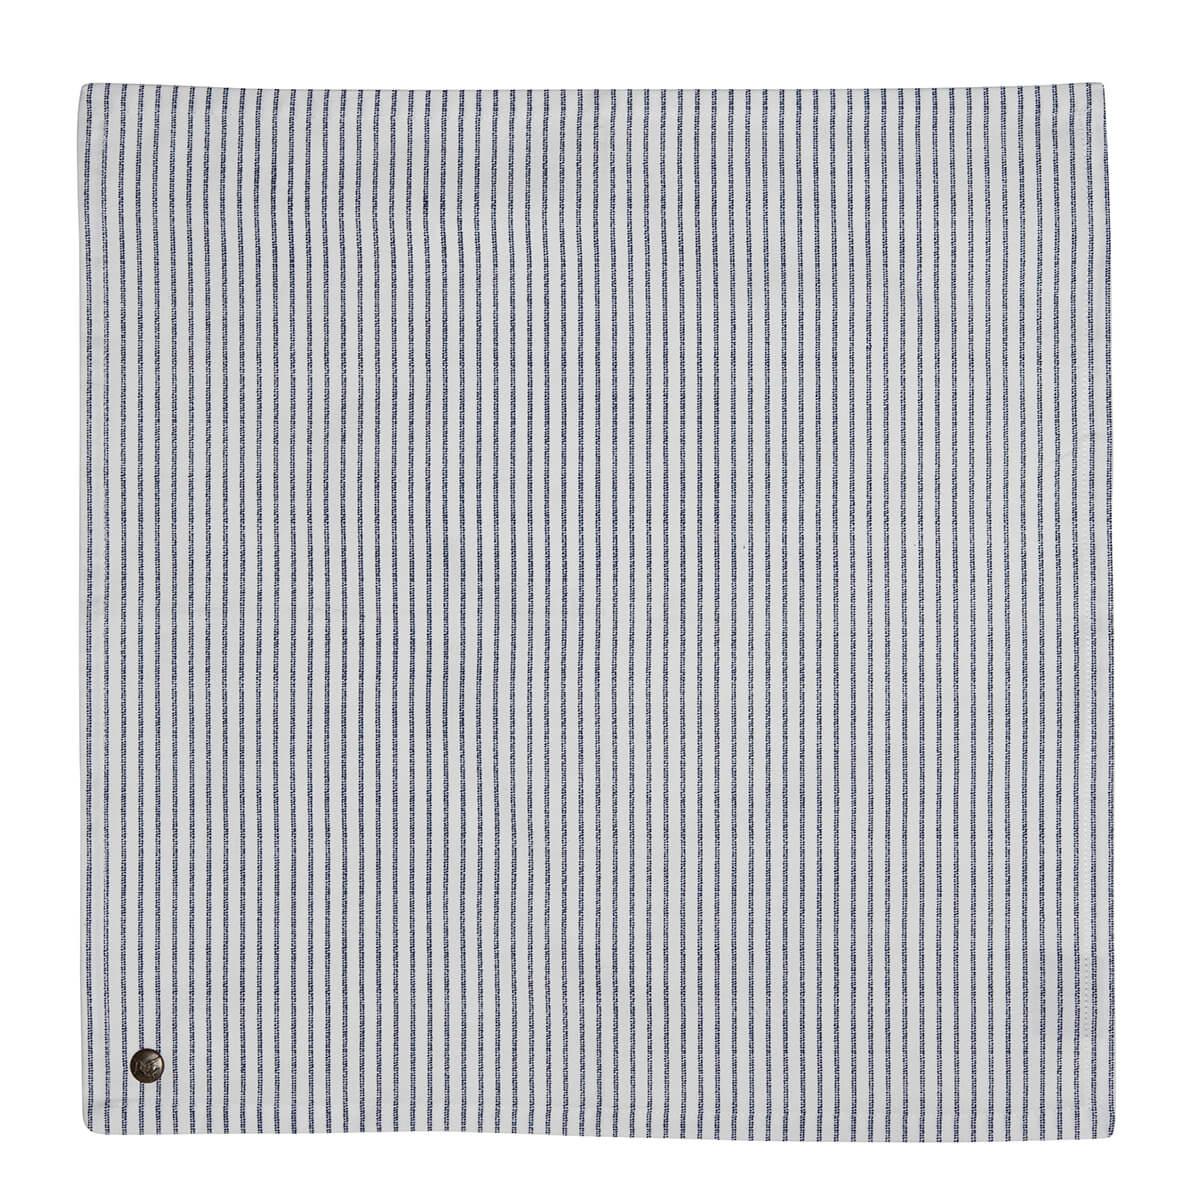 Онлайн каталог PROMENU: Тканевая салфетка Laura Ashley BLUEPRINT, 45х45 см, белый в синюю полоску Laura Ashley 178443